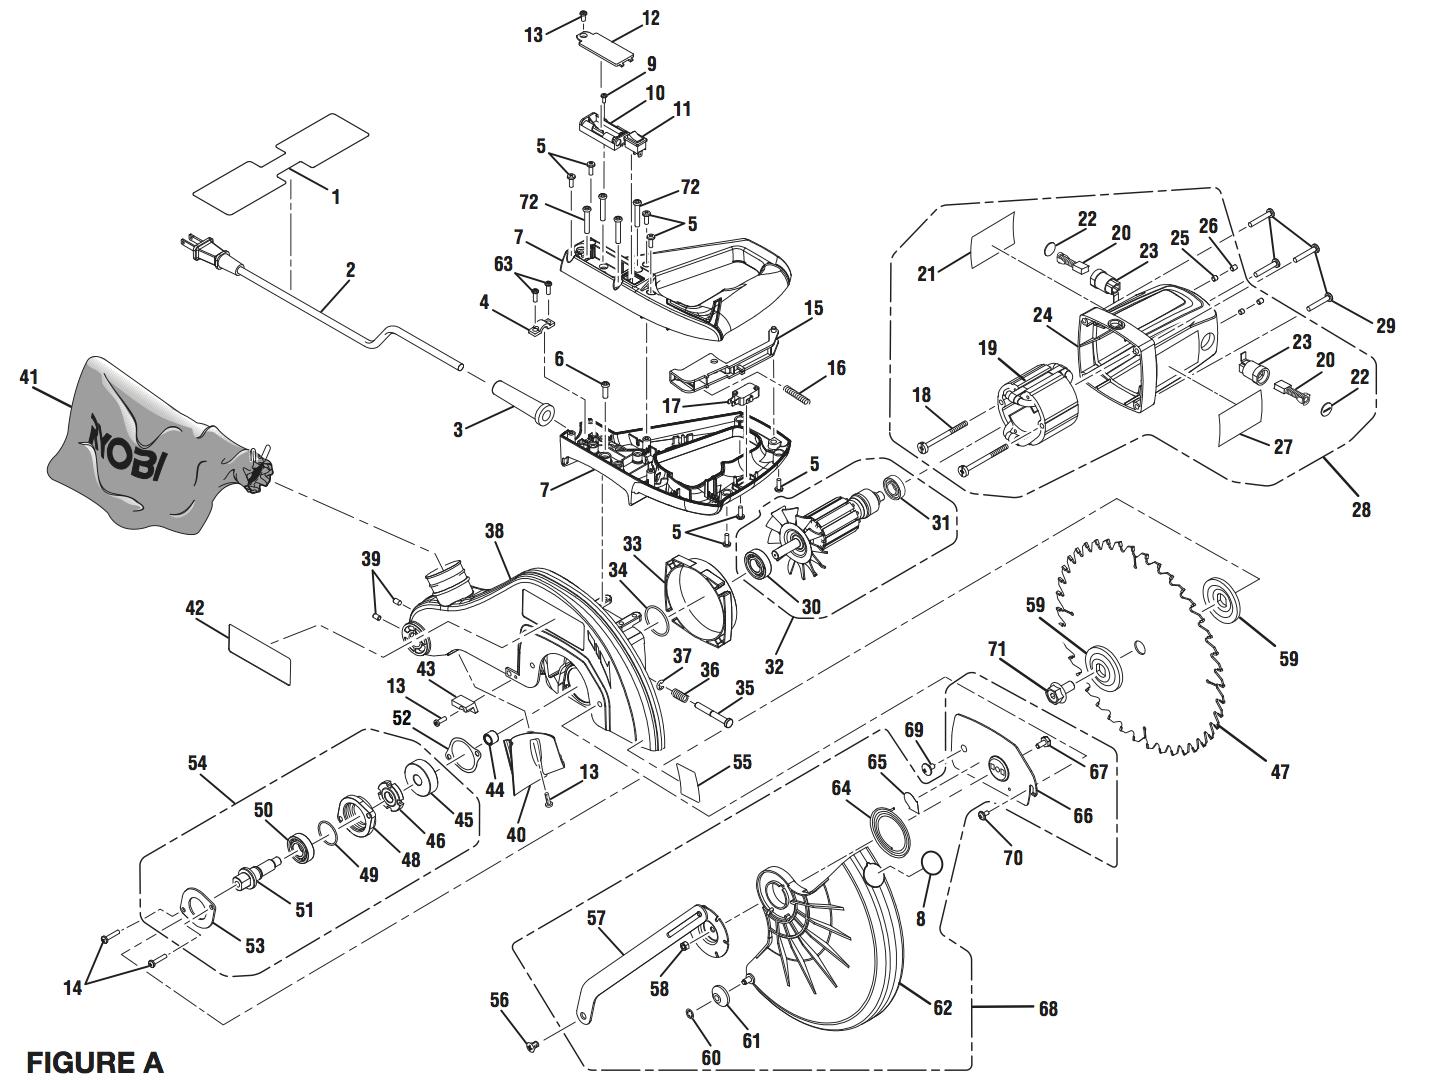 Ryobi Miter Saw Replacement Parts